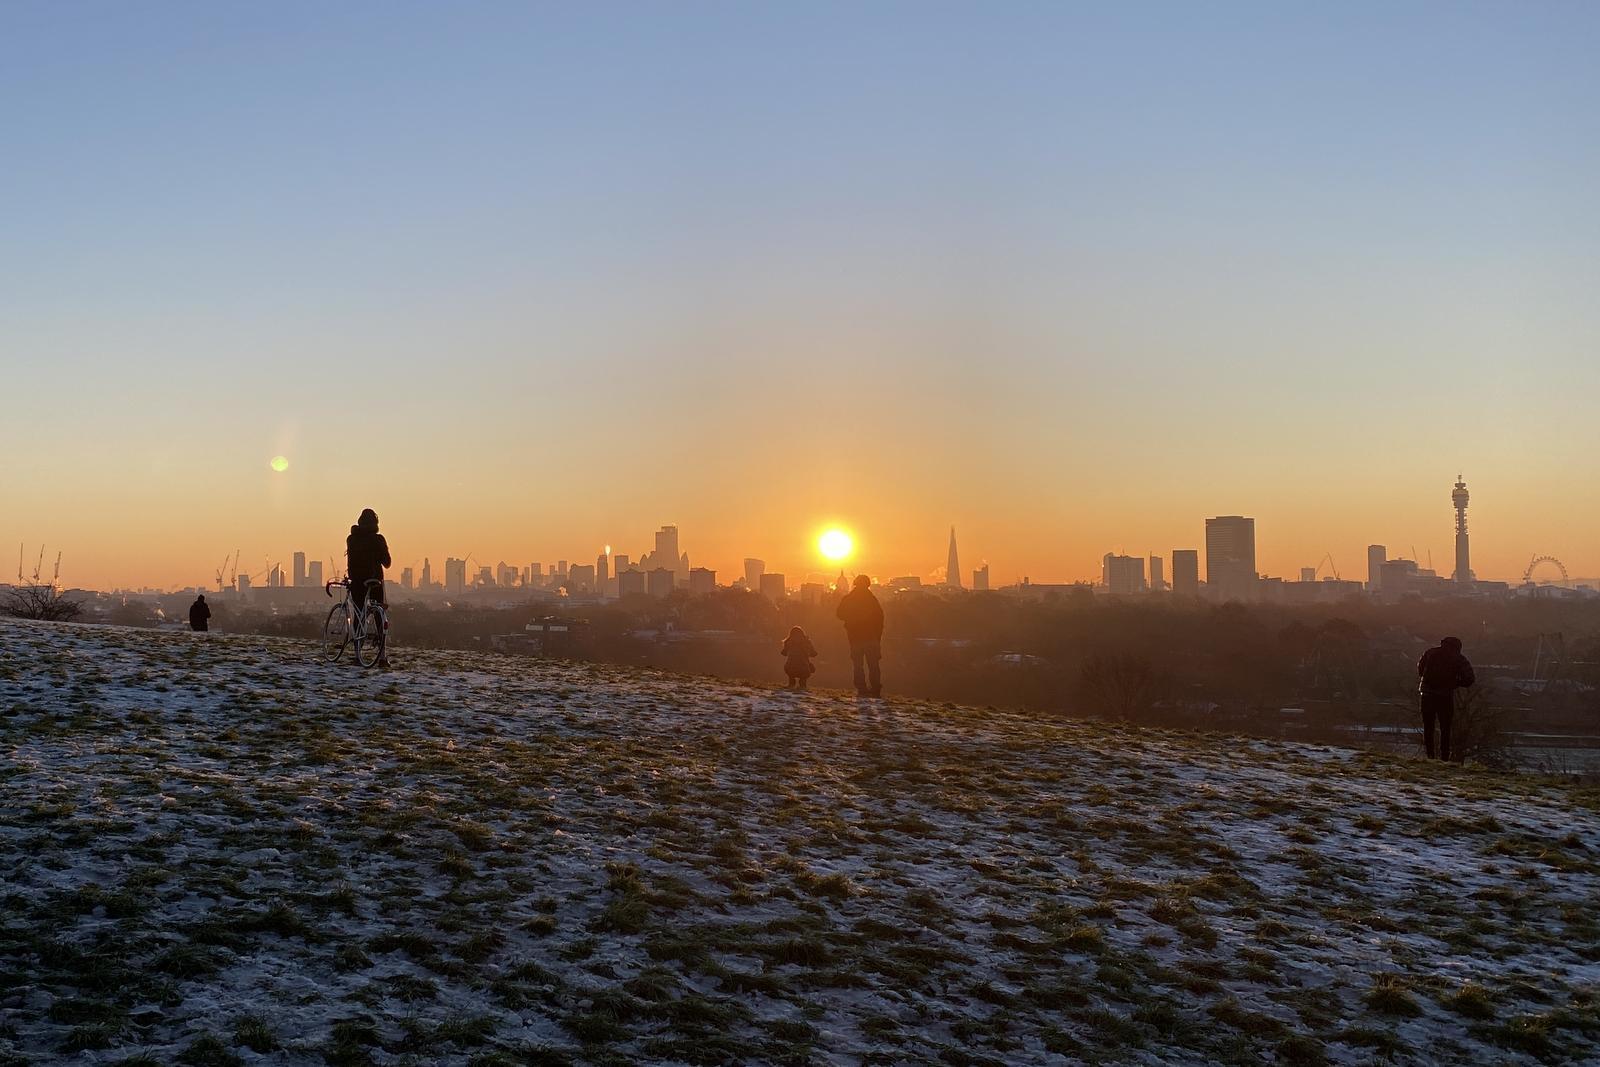 Sunrise over Primrose Hill